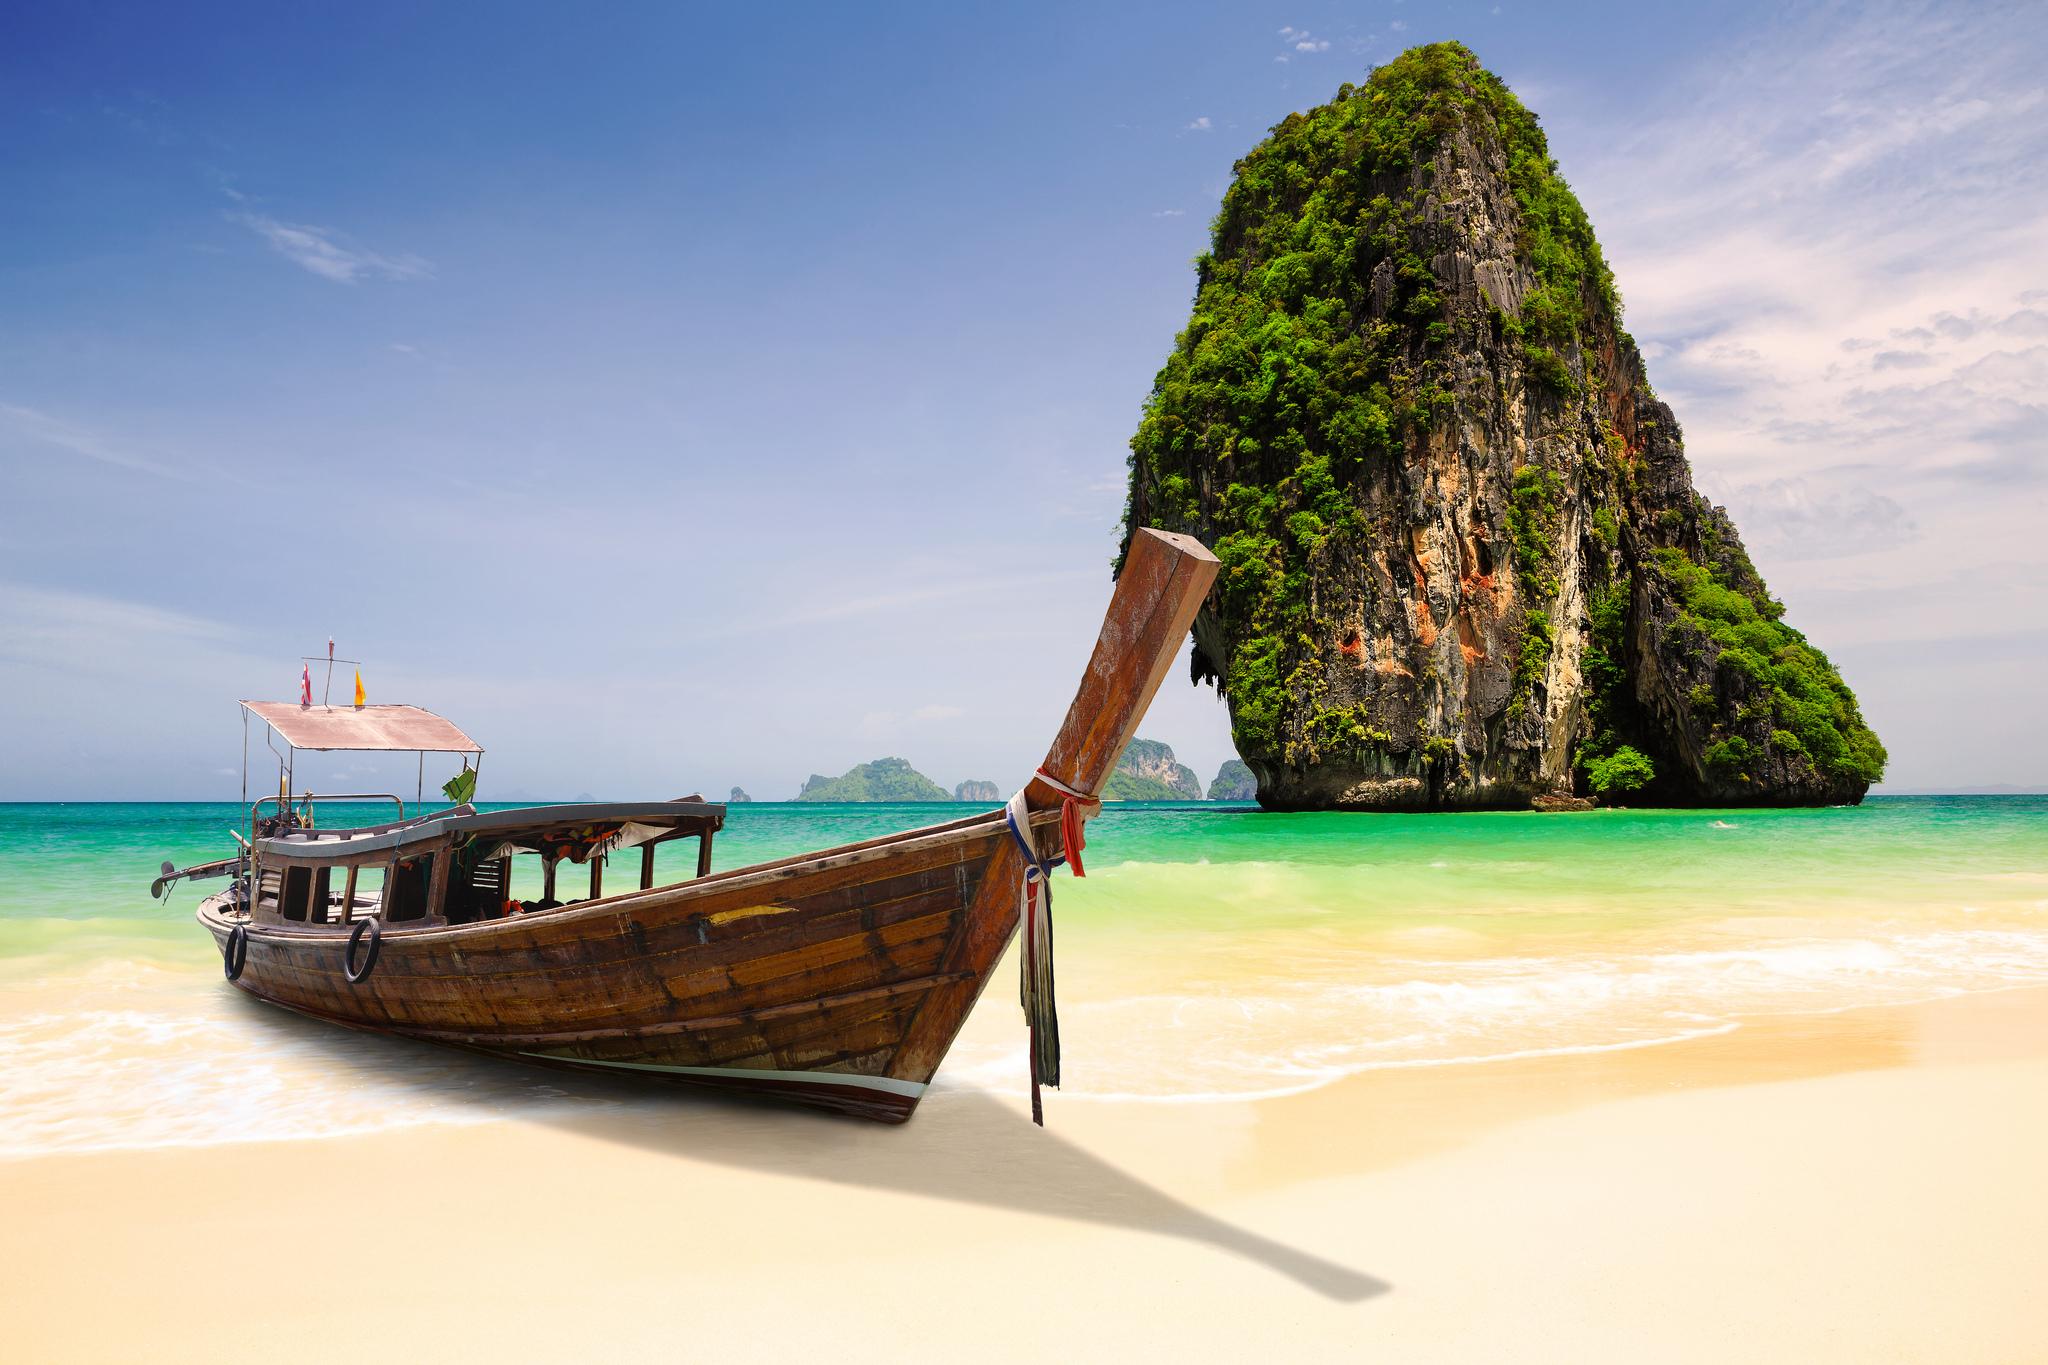 День, картинки тайланда паттайя острова